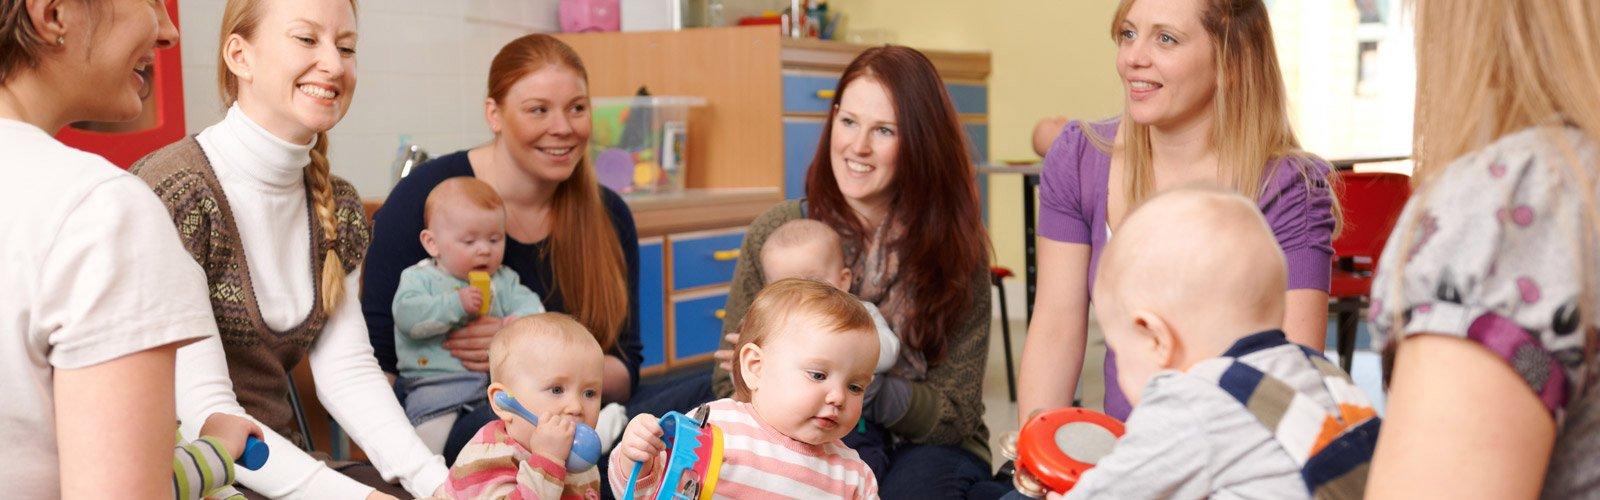 Getting Ahead of Postnatal Depression Group Program